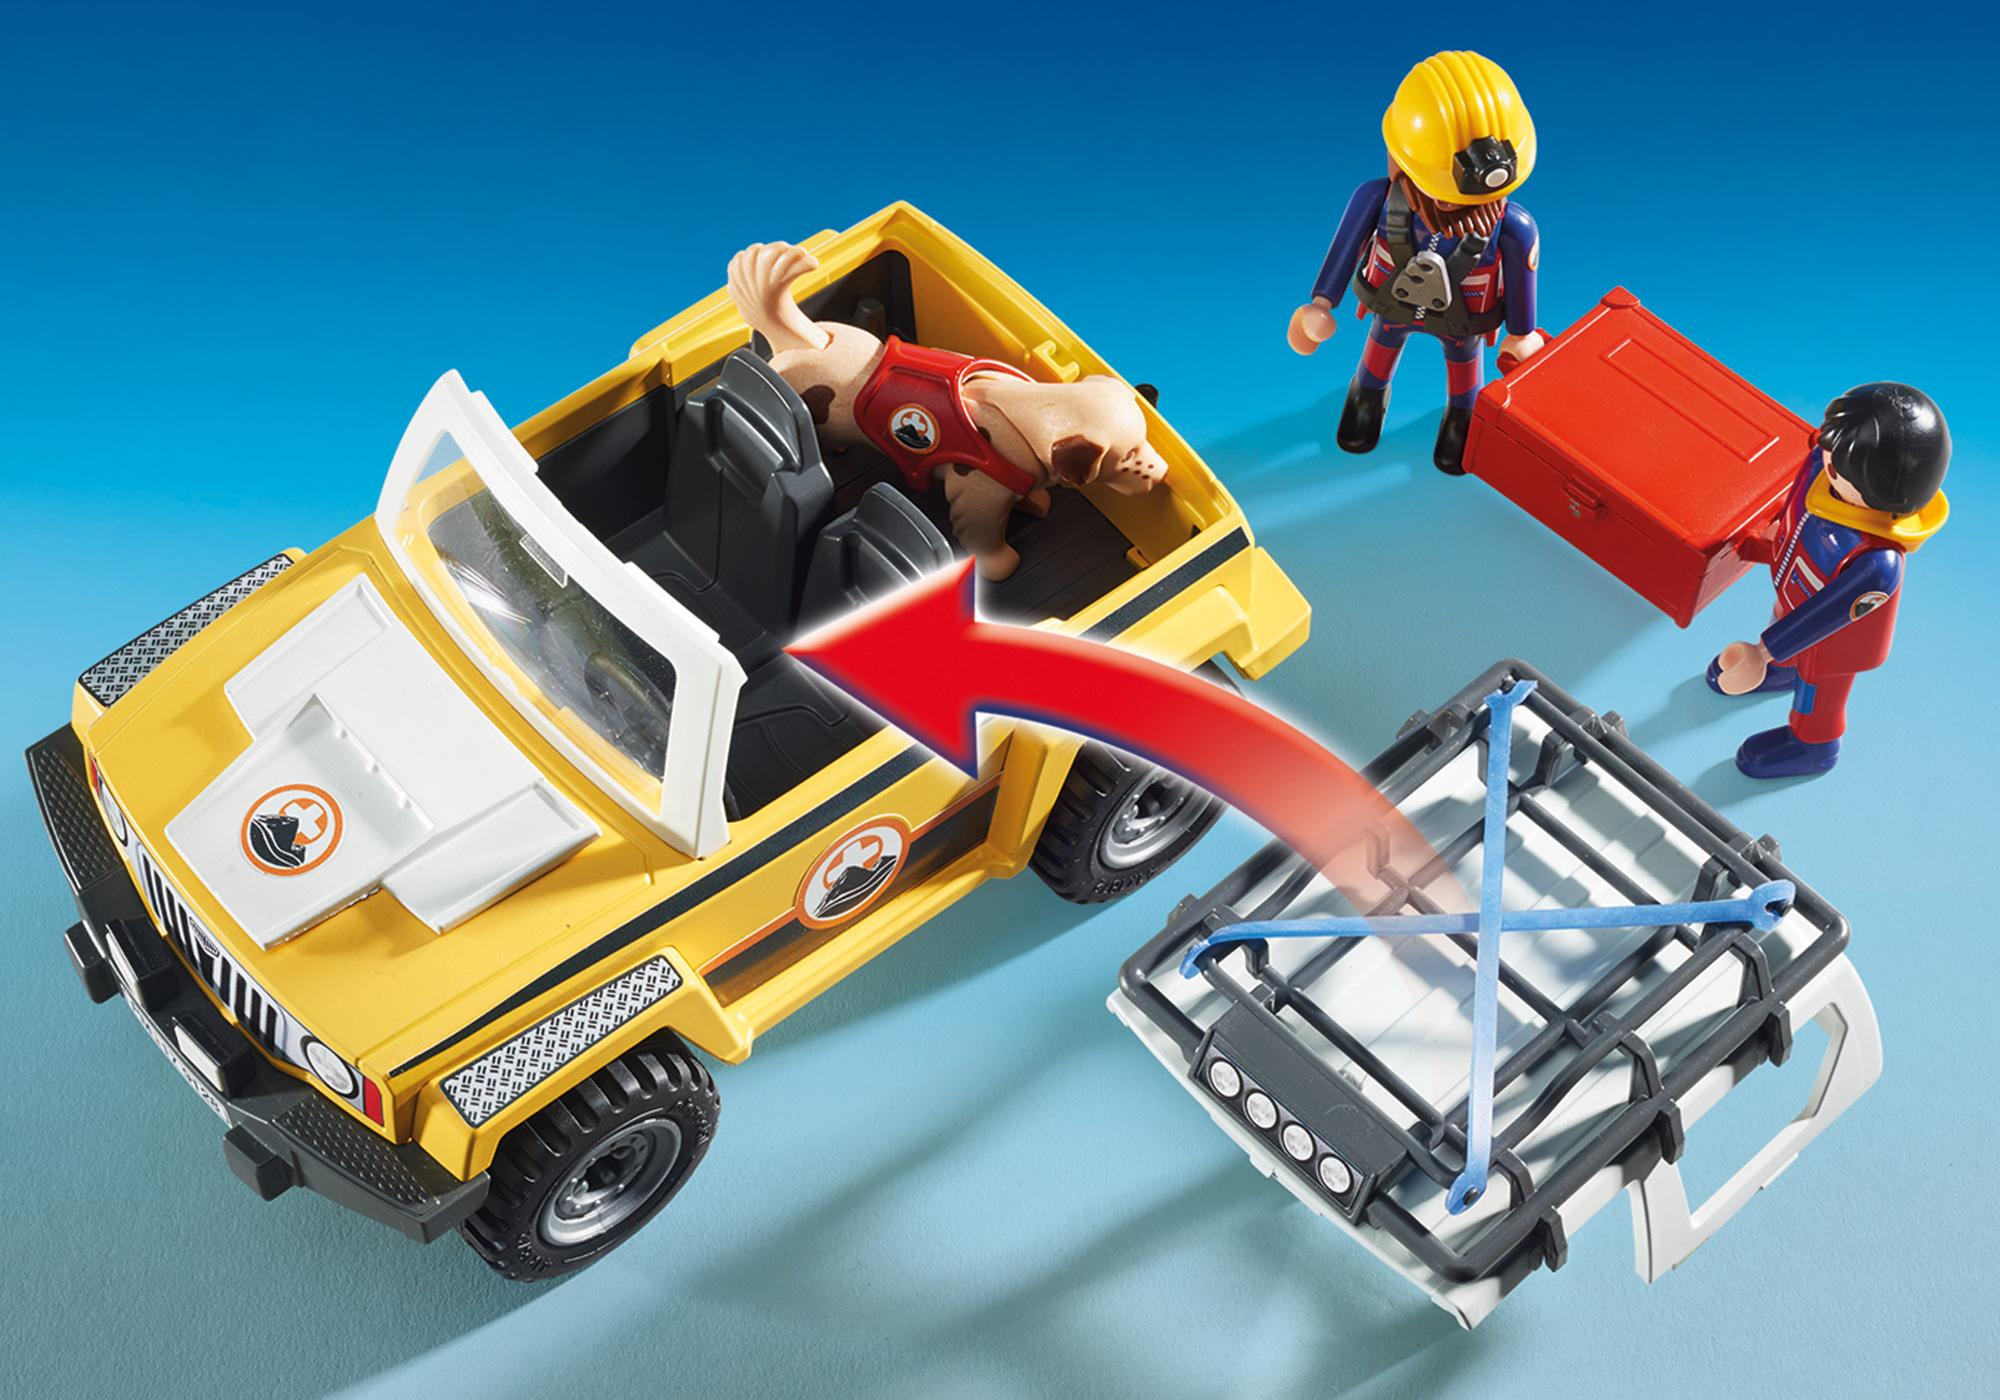 http://media.playmobil.com/i/playmobil/9128_product_extra3/Mountain Rescue Truck